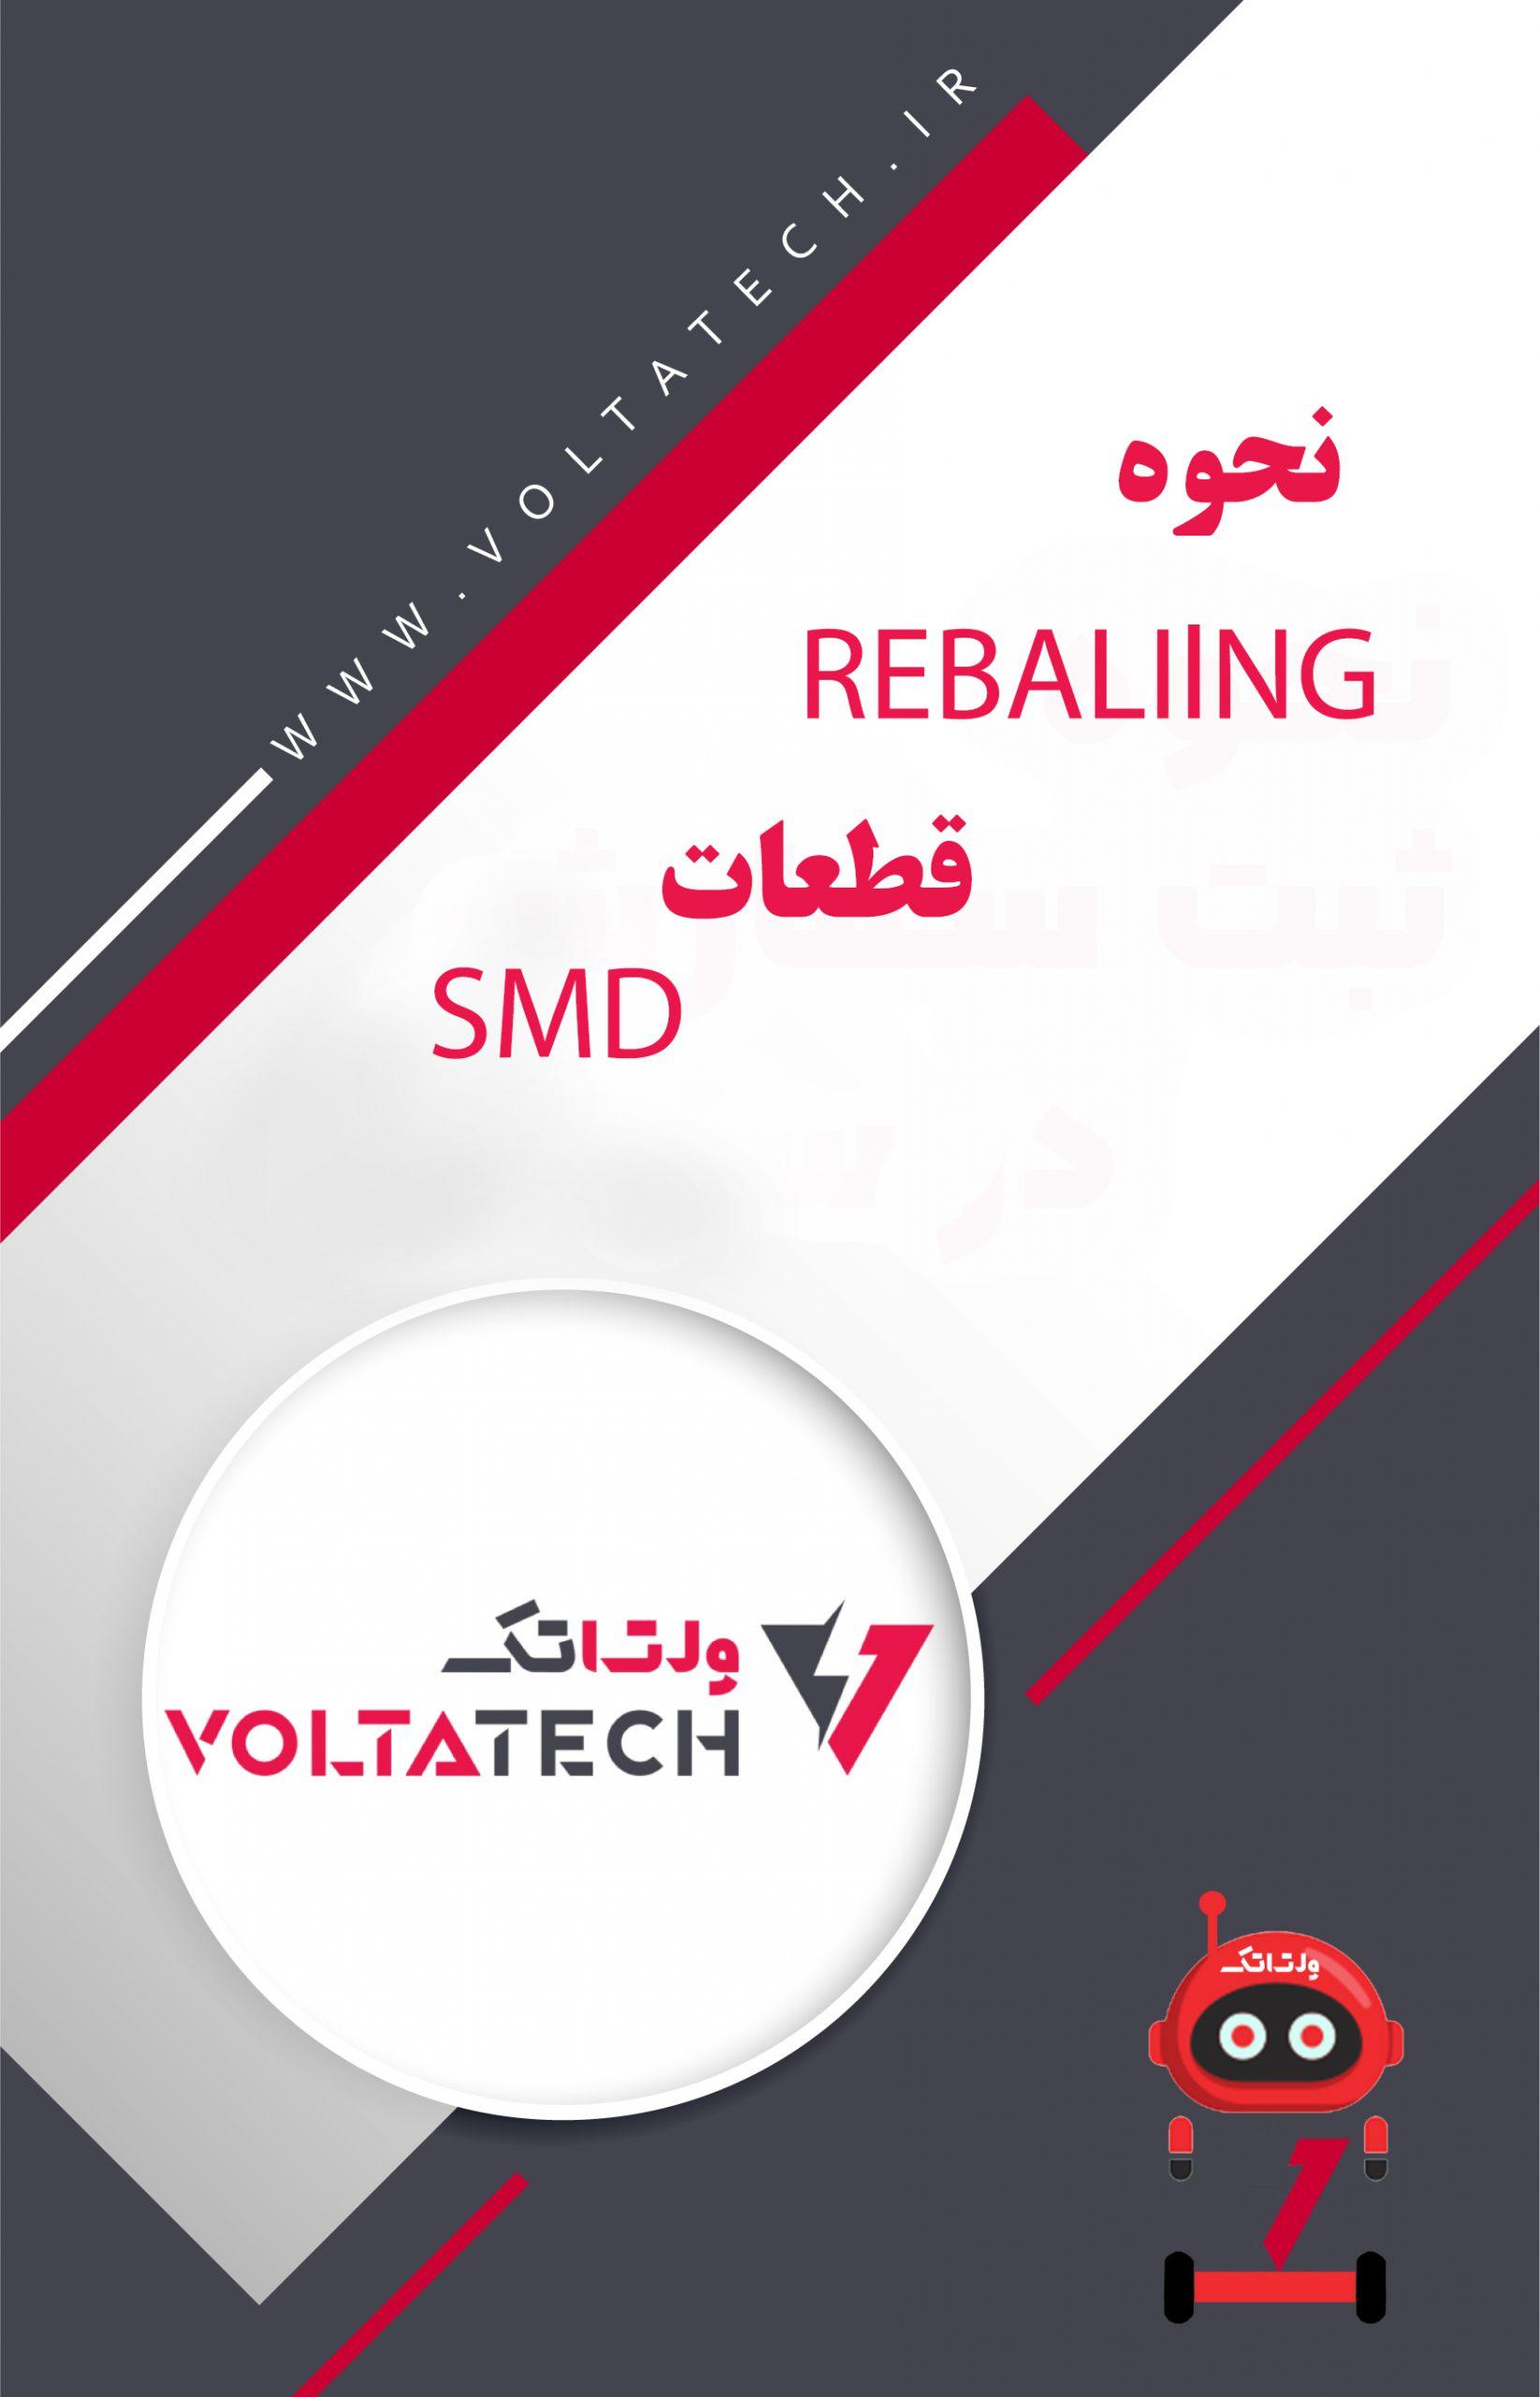 آموزش REBALIING (شابلون زدن) قطعات SMD